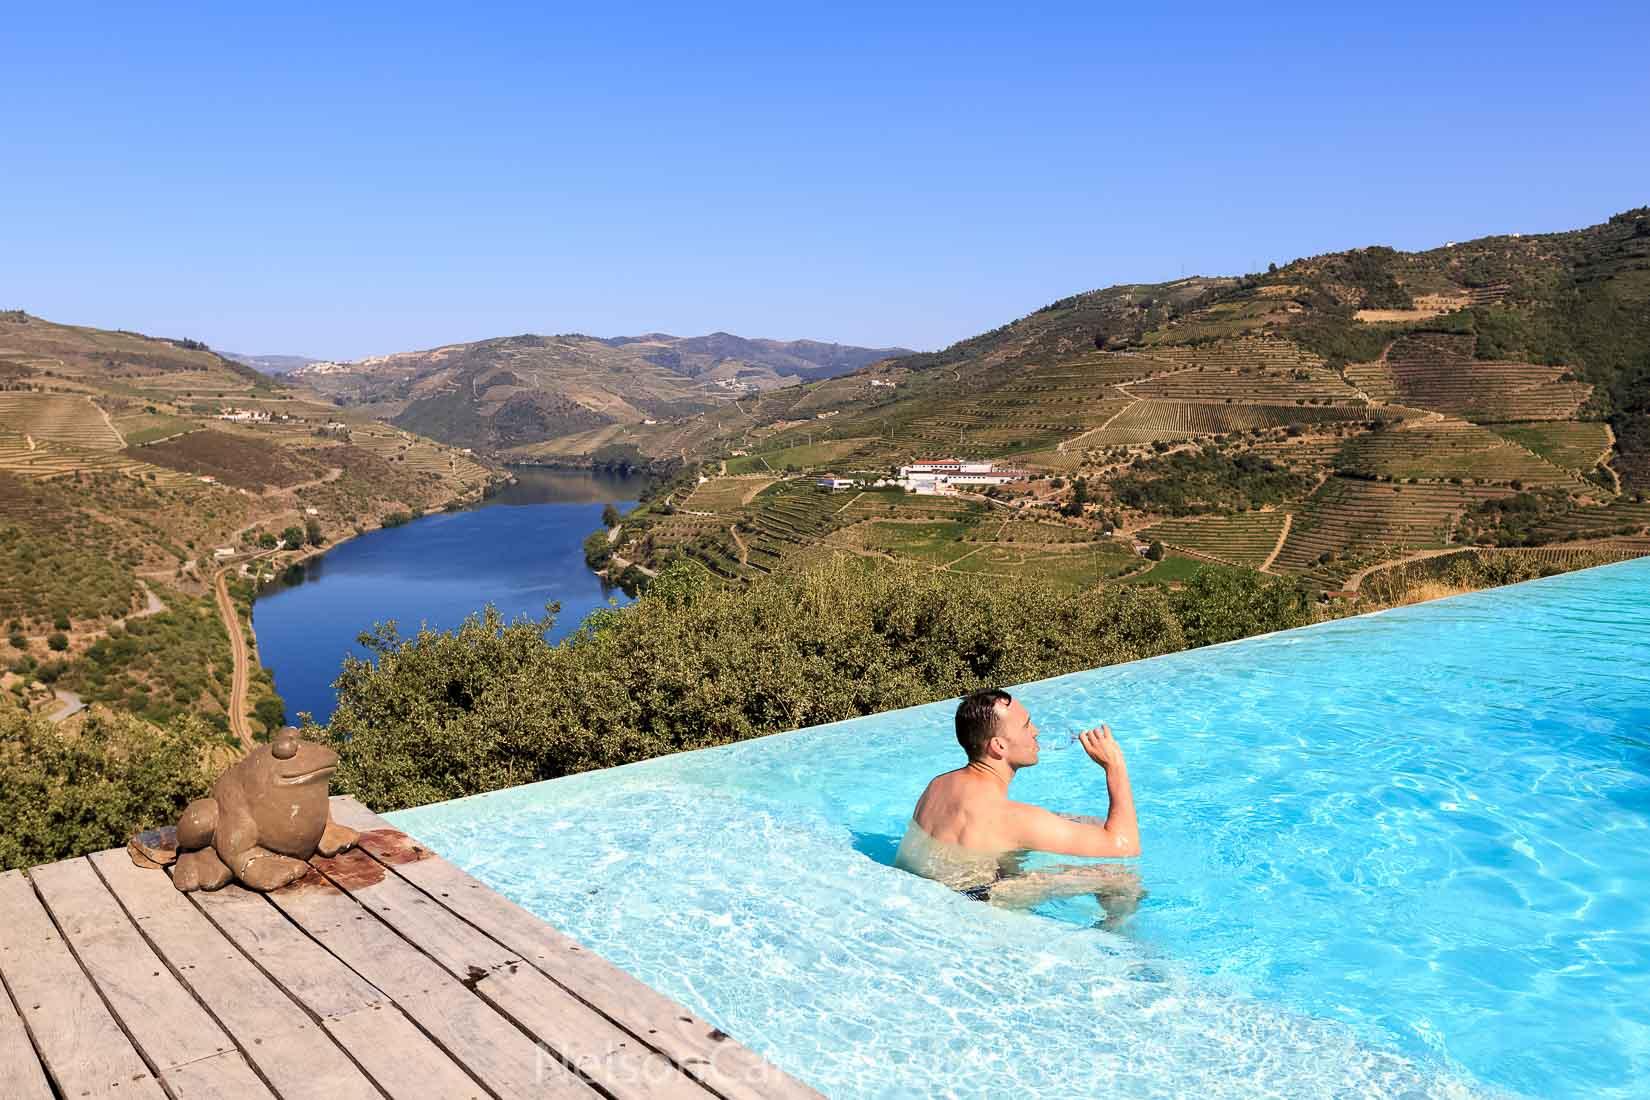 quinta-do-crasto-panoramic-pool.jpg